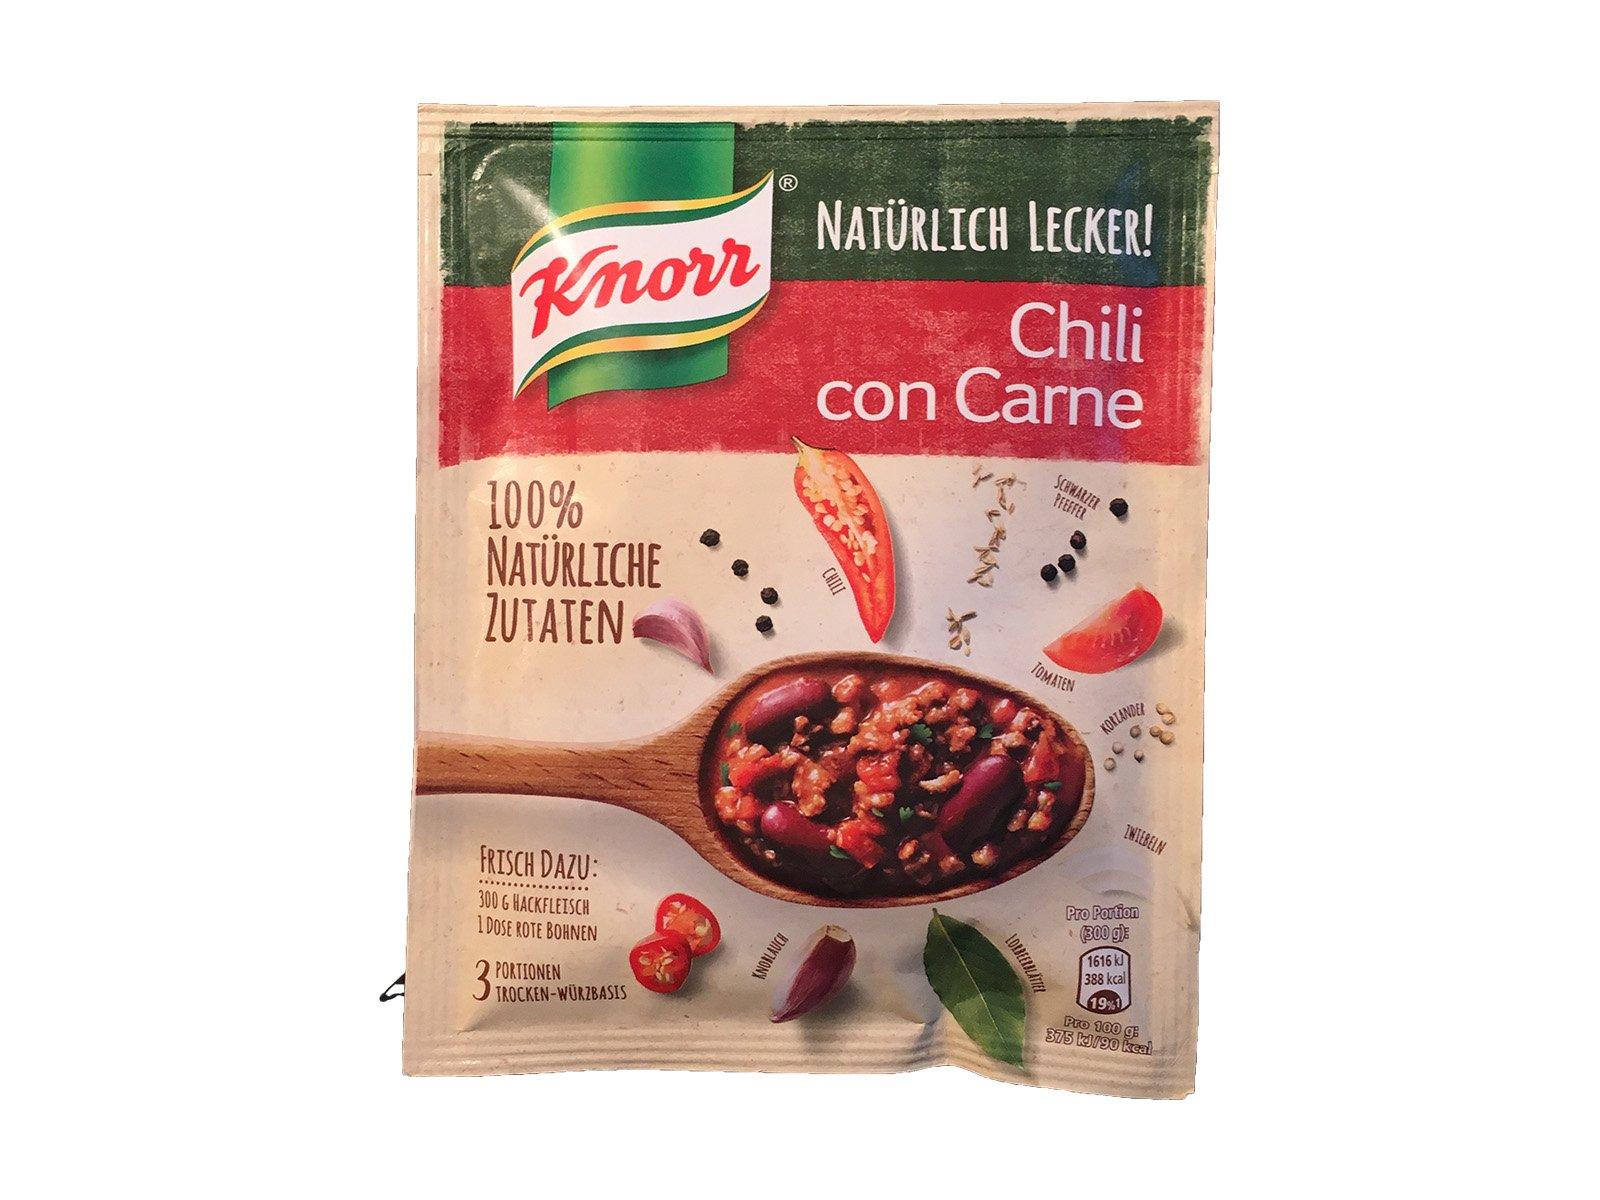 Testberichte Knorr Natürlich Lecker Chili Con Carne Kjerocom